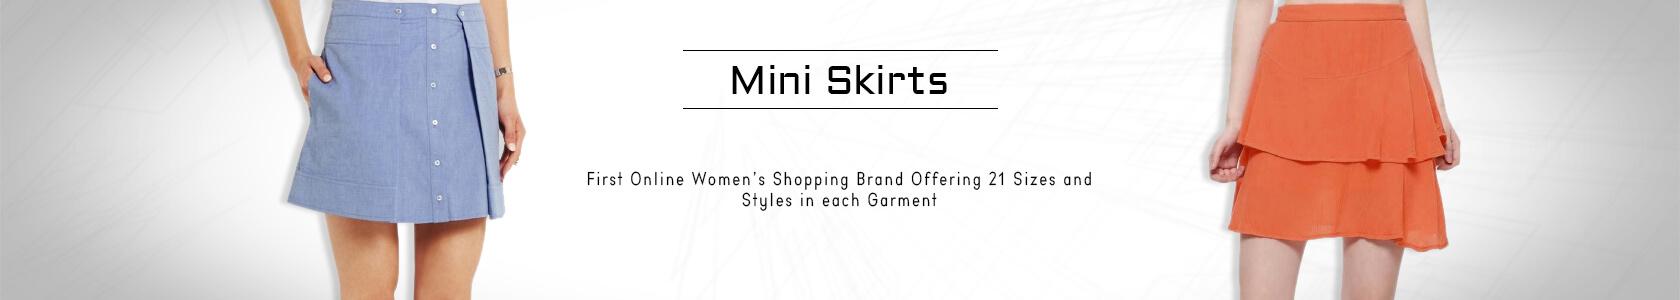 Mini Skirts